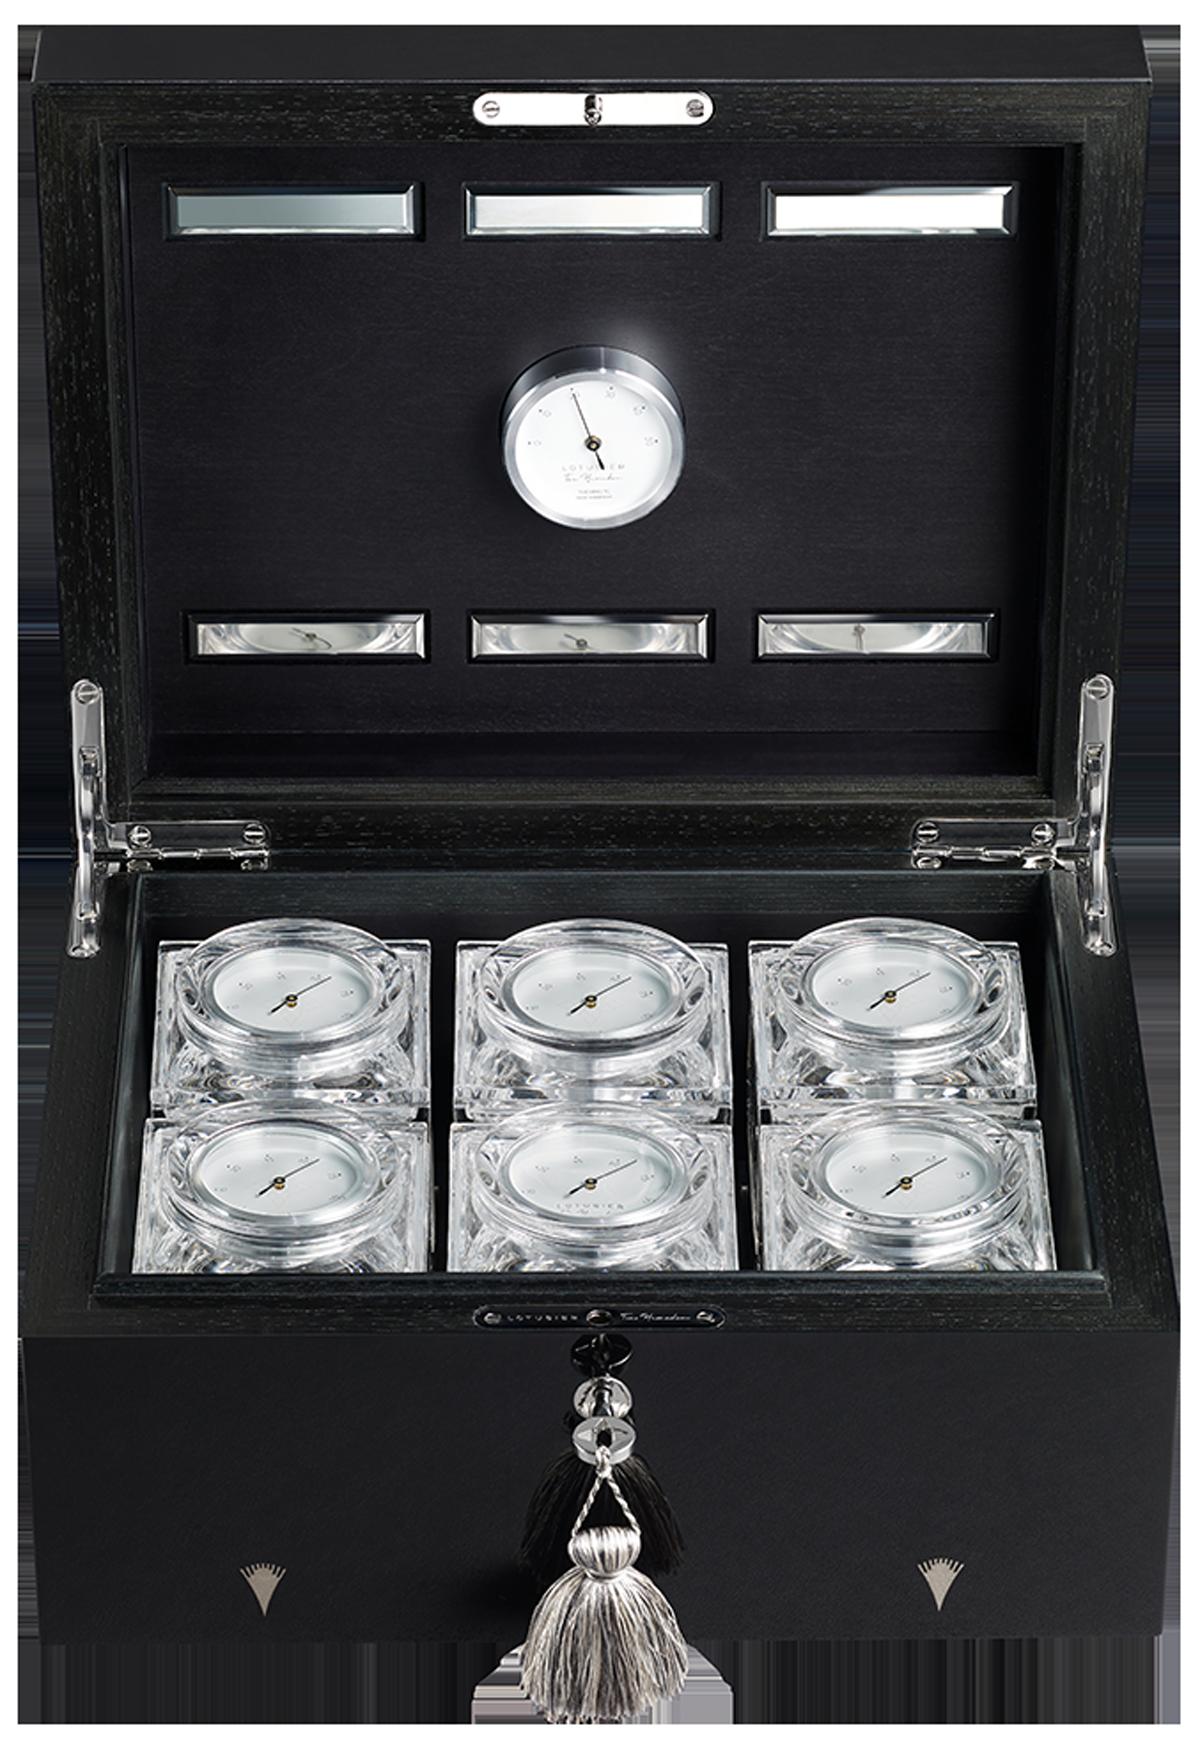 configuration 6 crystal configuration